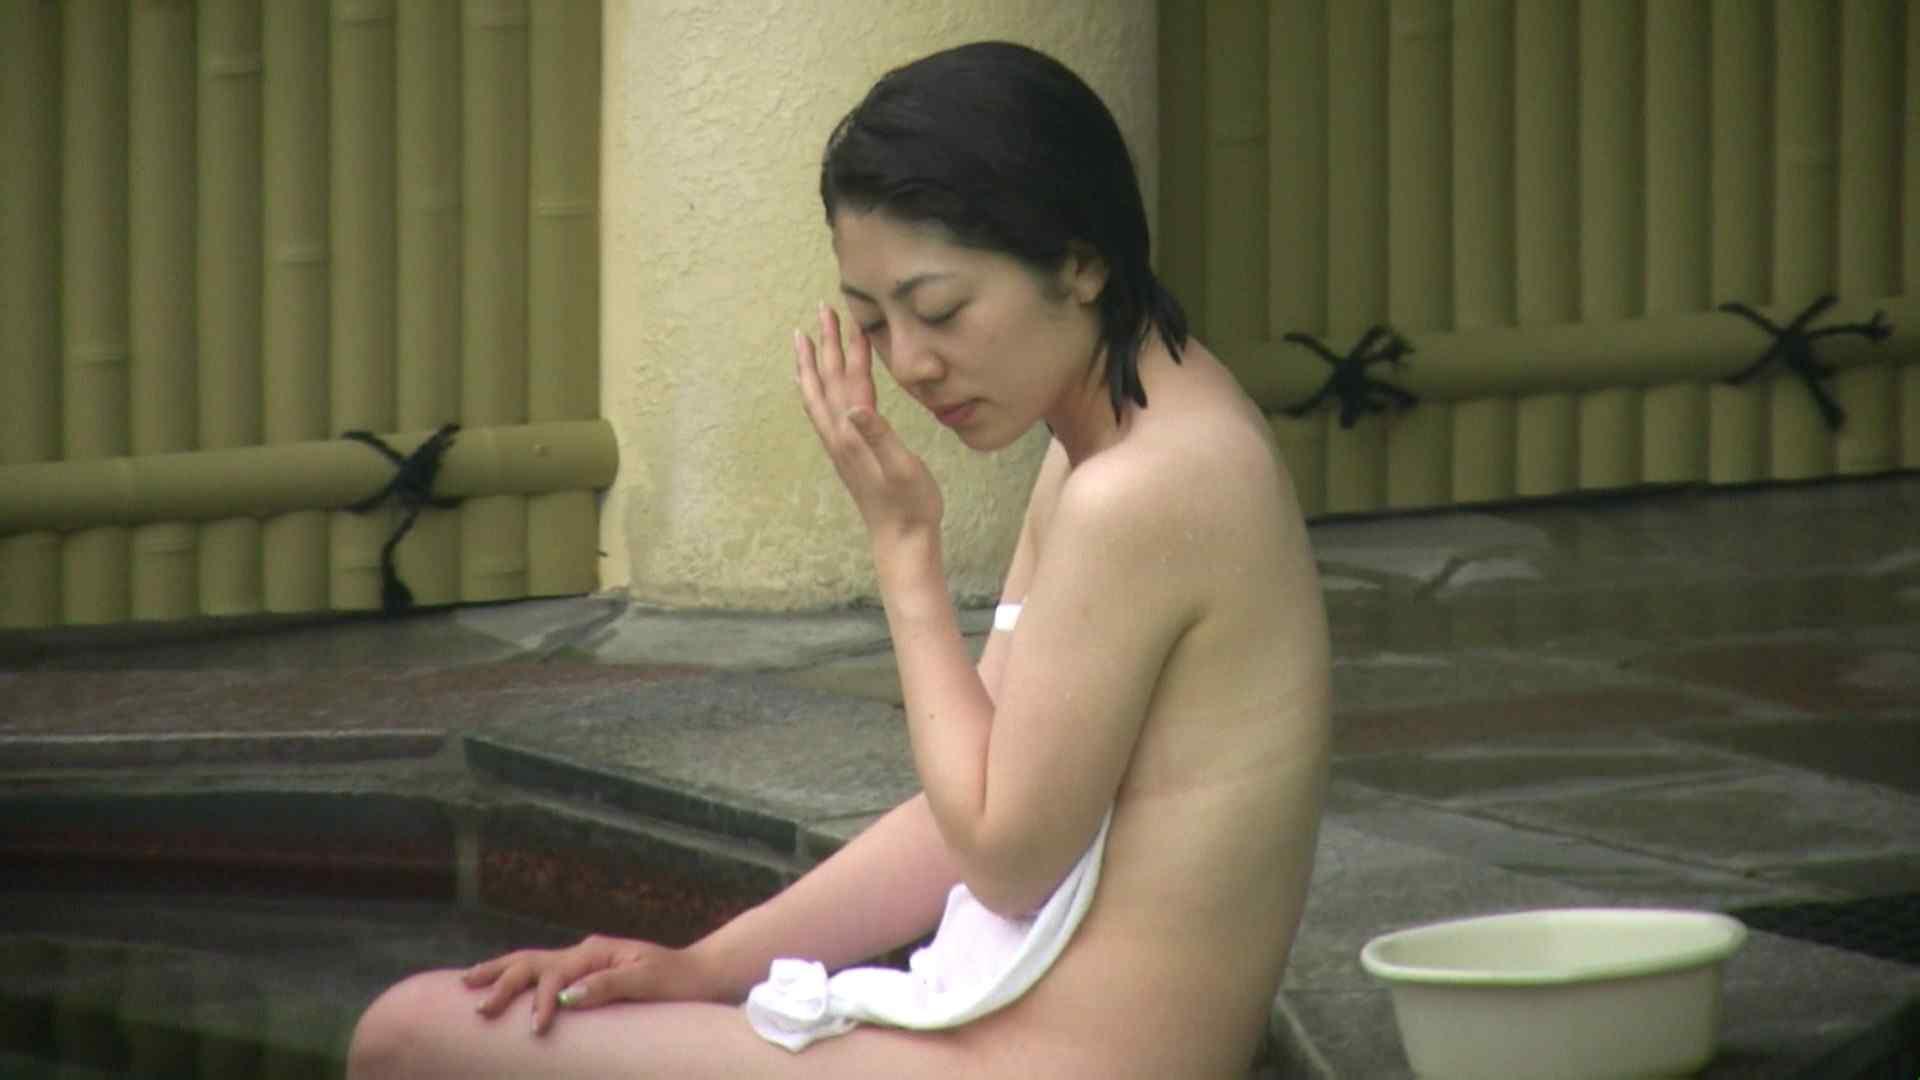 Aquaな露天風呂Vol.04 OLのプライベート 盗み撮り動画キャプチャ 10pic 5